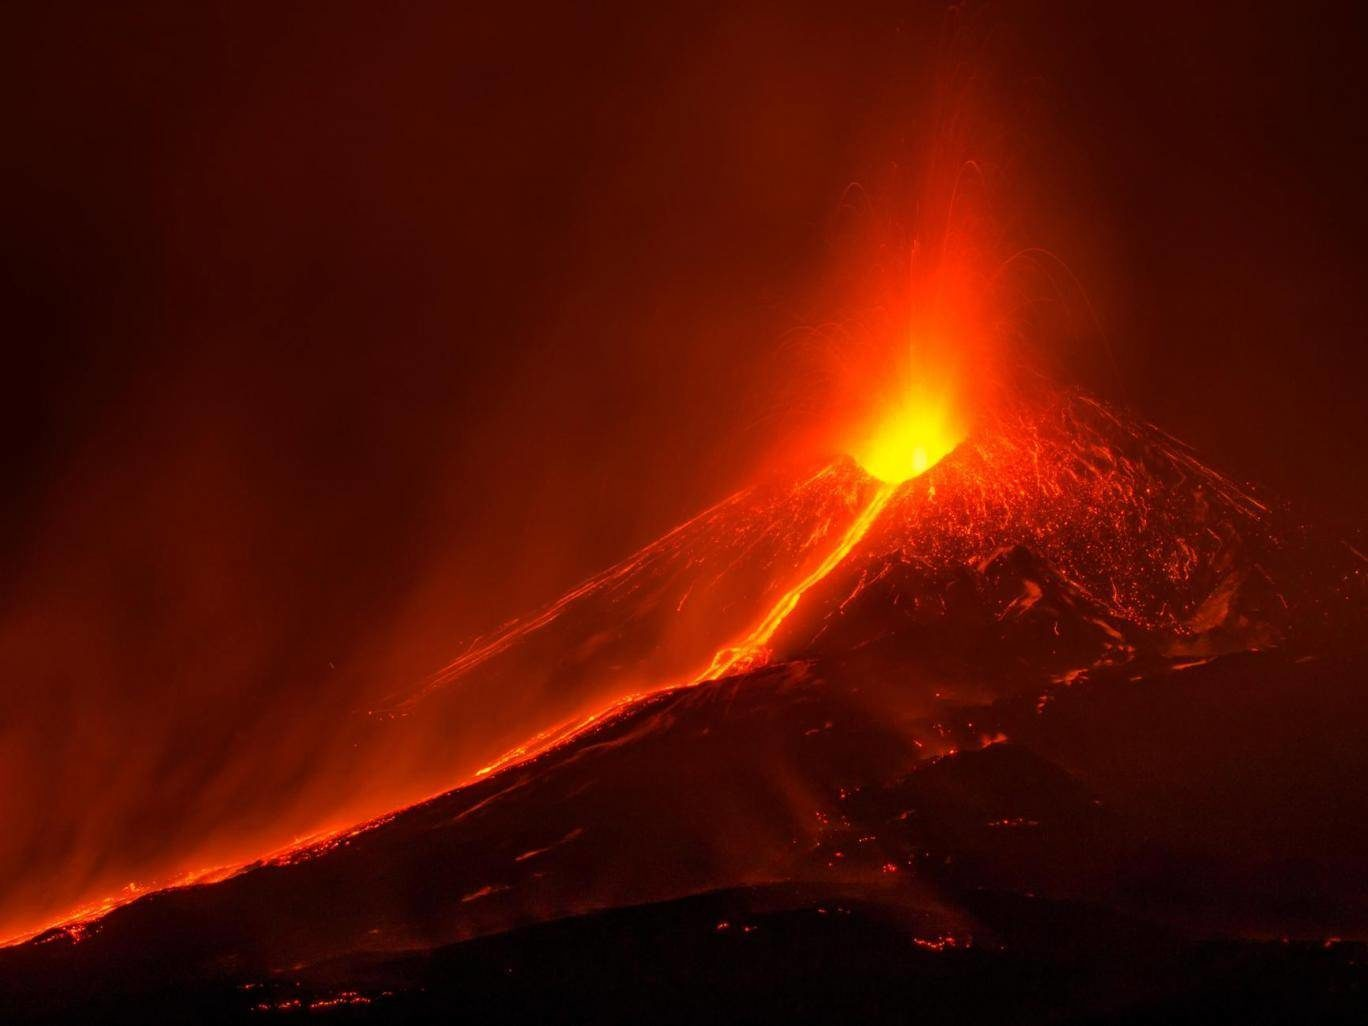 Hawaii Kilauea volcano eruption: National Park Map - where is Mount Kilauea?